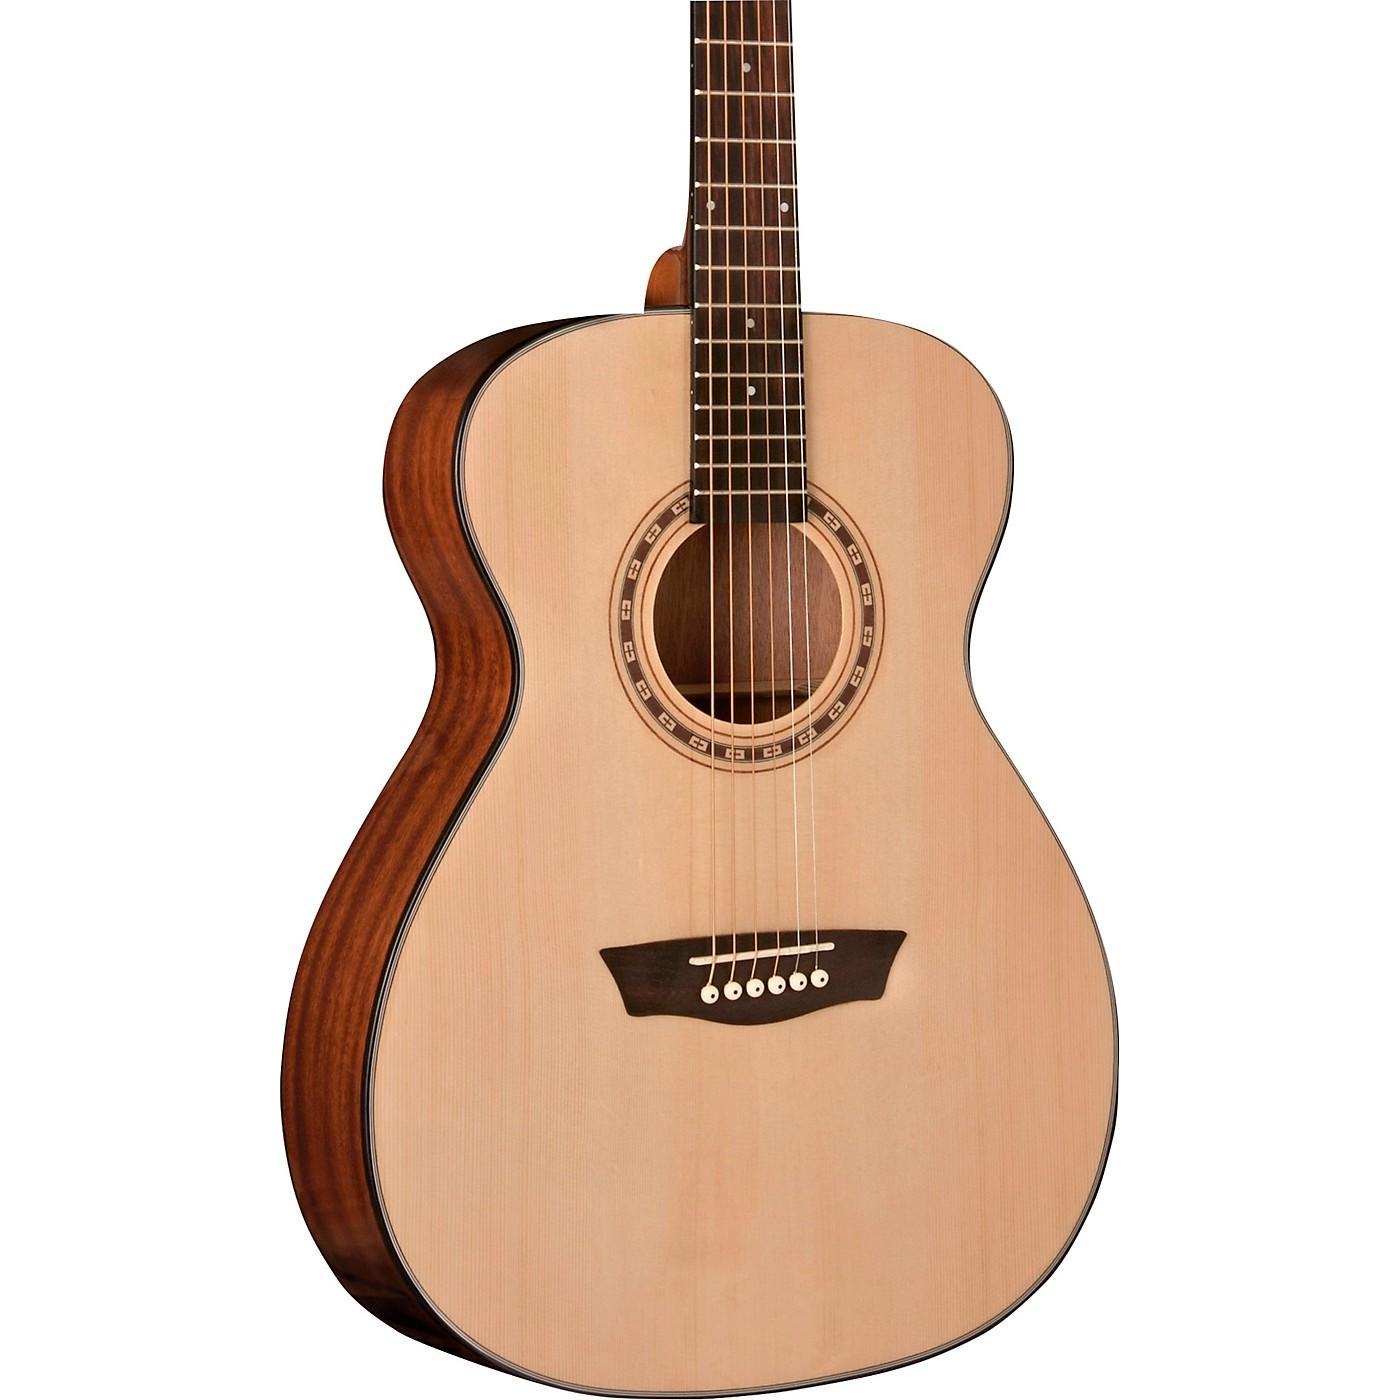 Washburn F5 Apprentice Series Folk Acoustic Guitar thumbnail